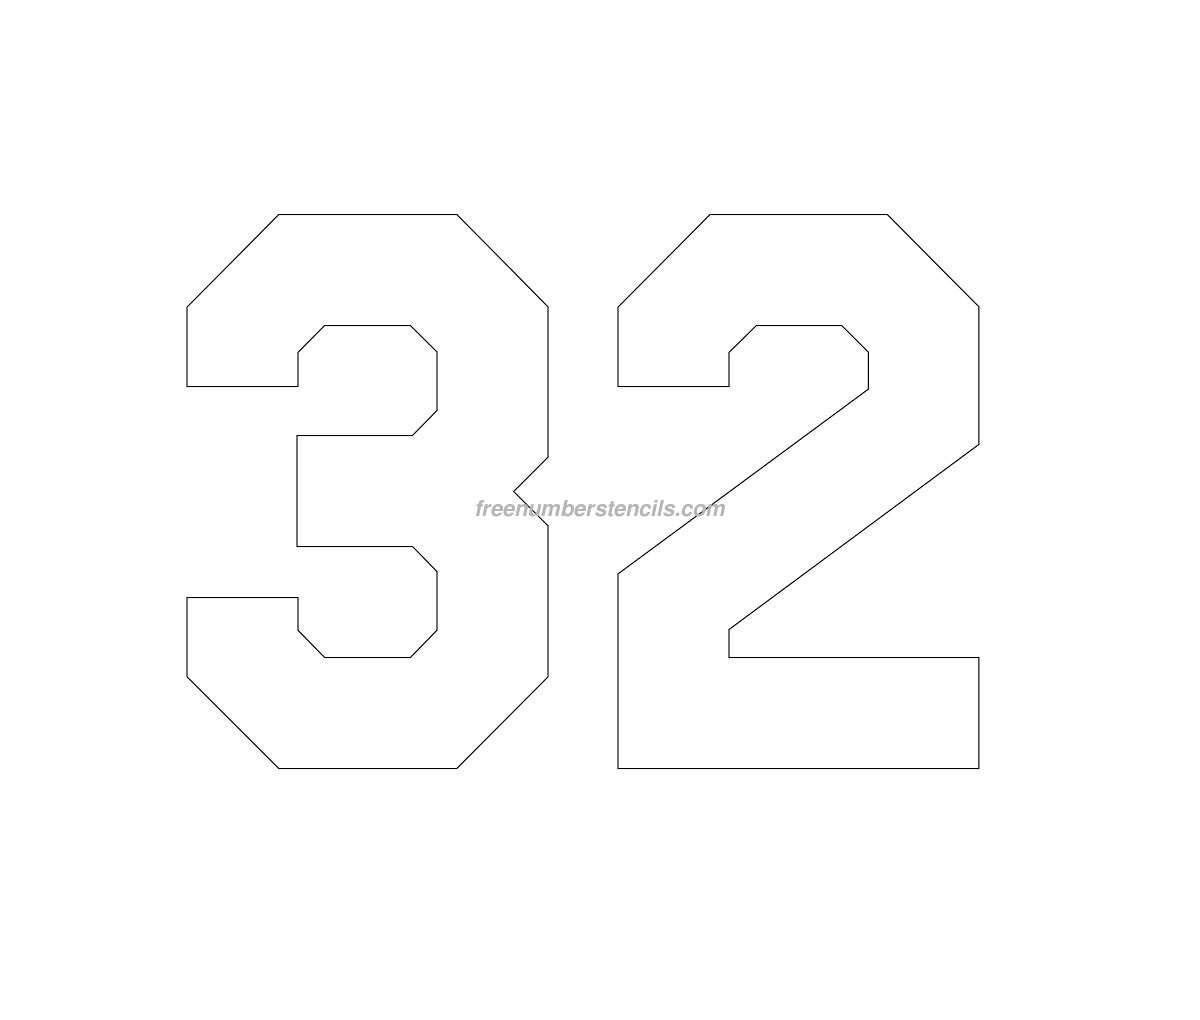 free jersey printable 88 number stencil freenumberstencils com